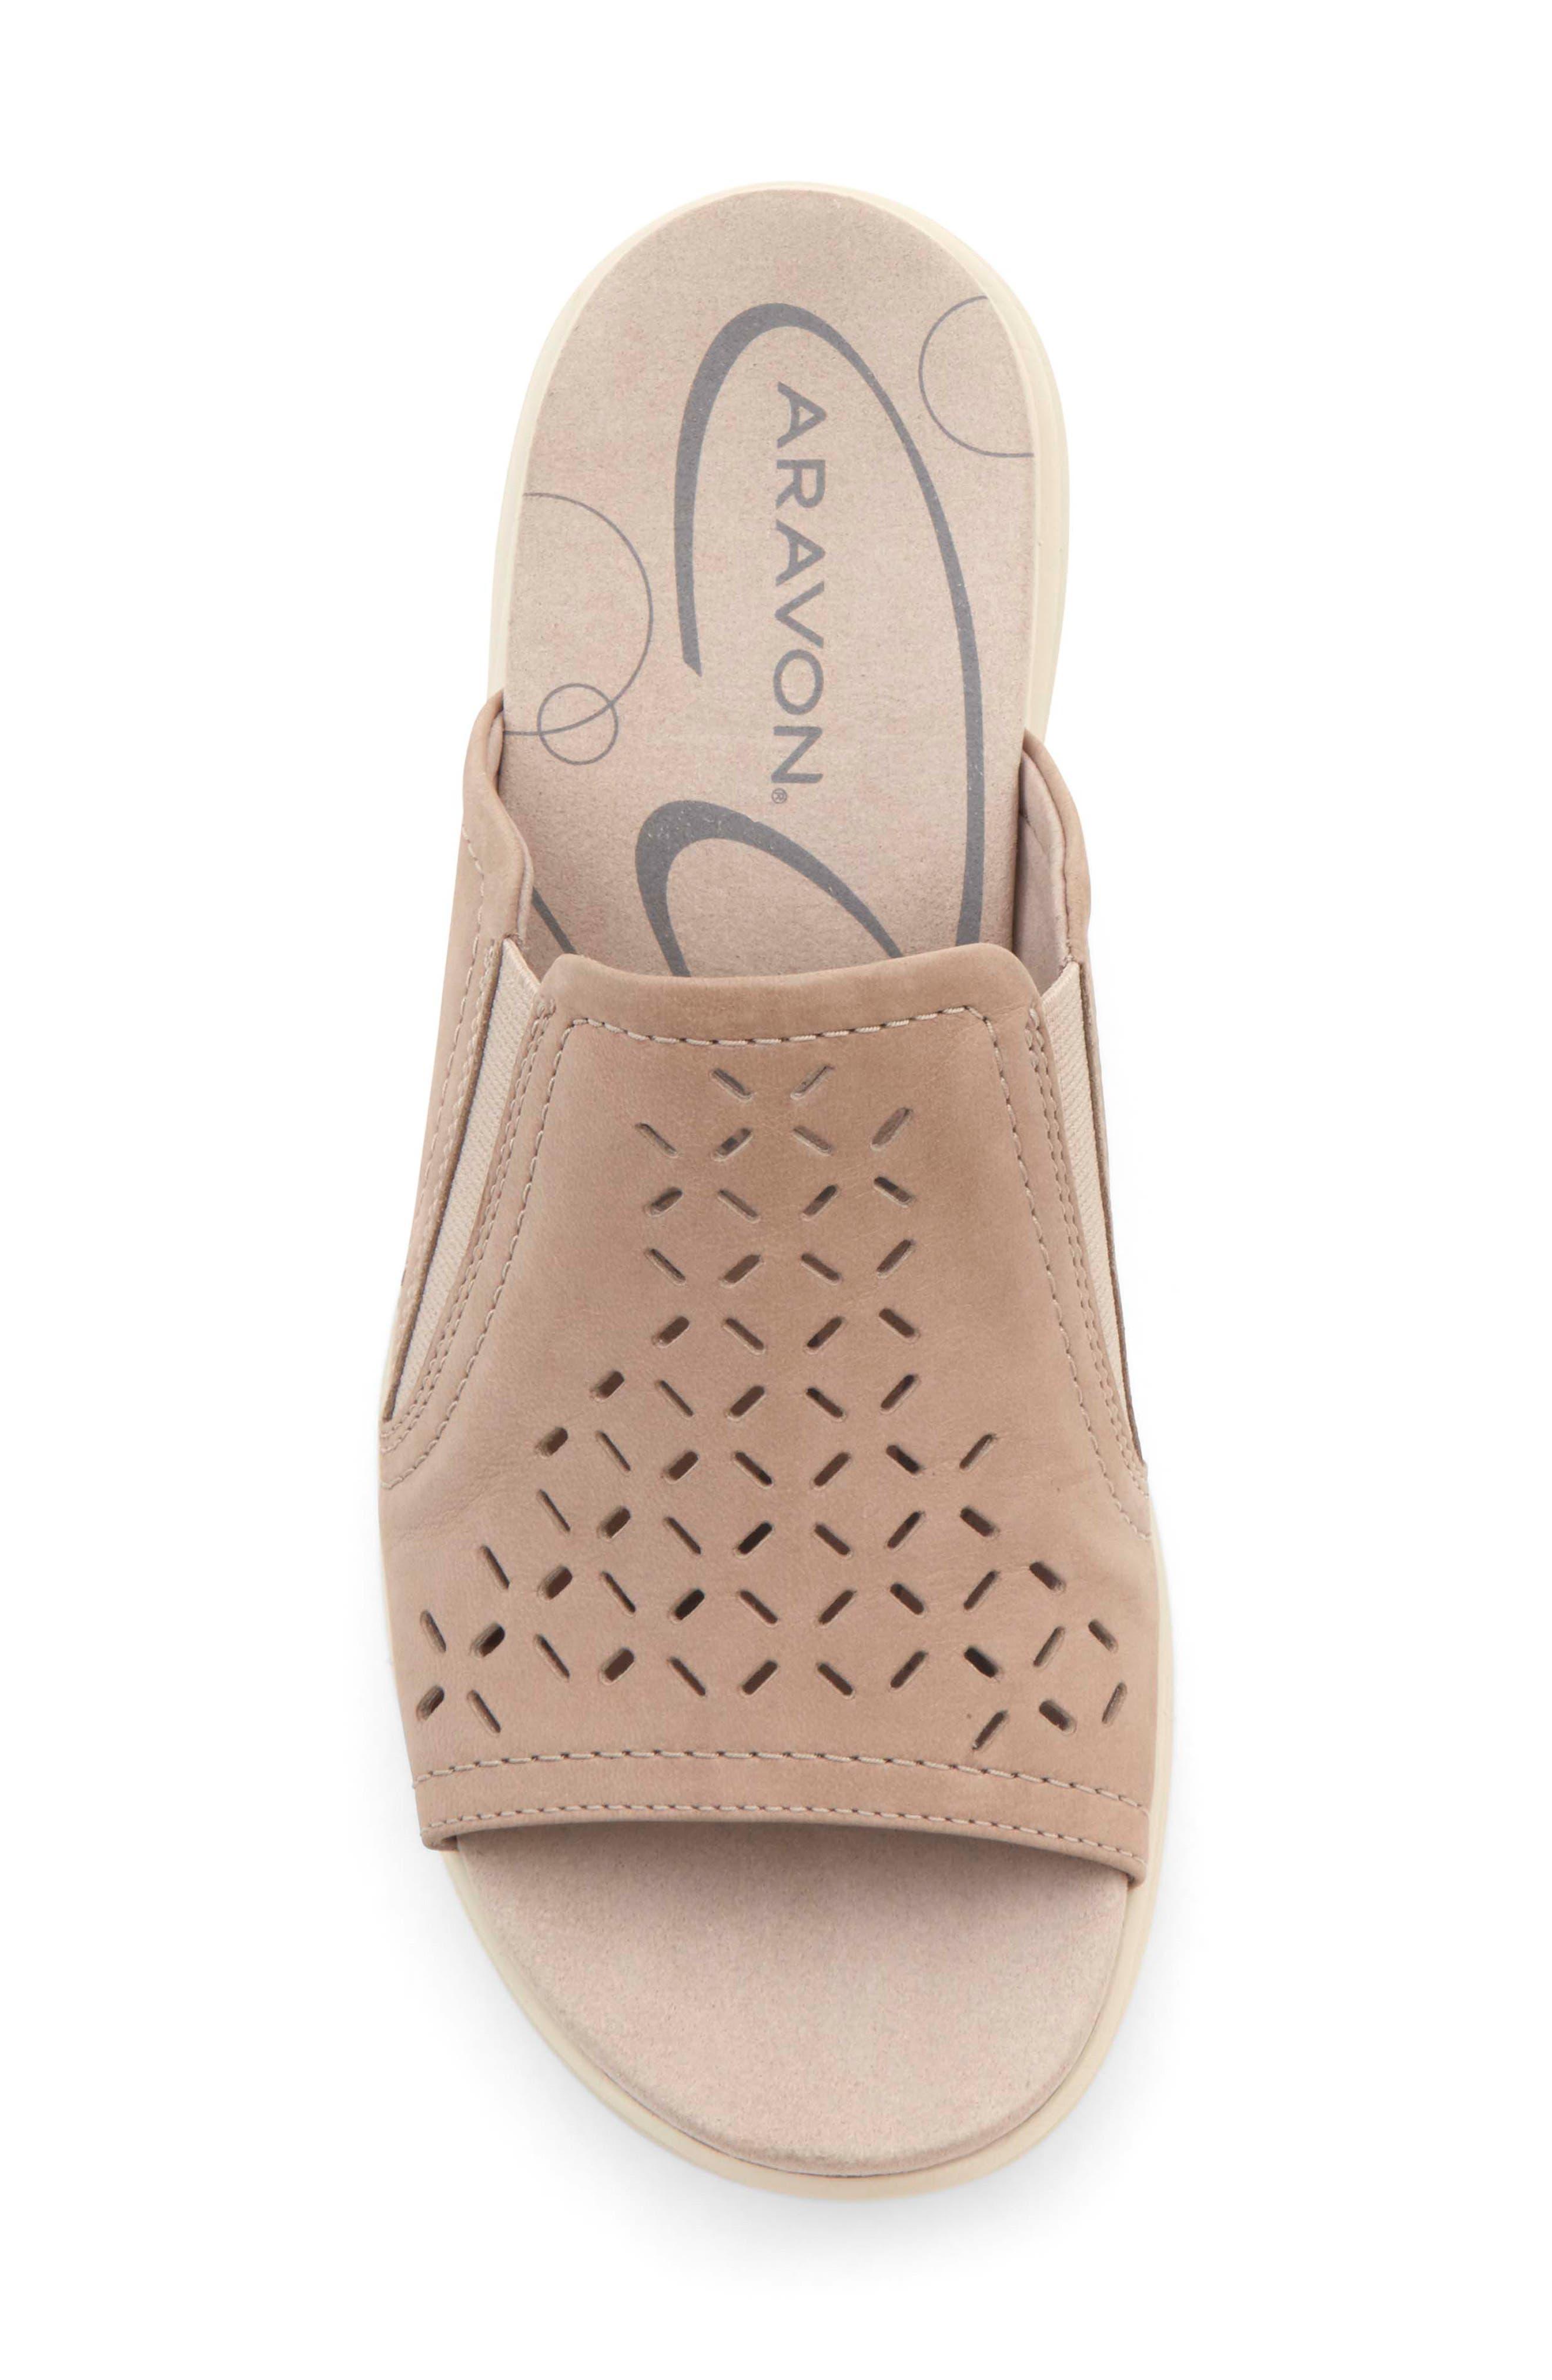 Beaumont Slide Sandal,                             Alternate thumbnail 5, color,                             250